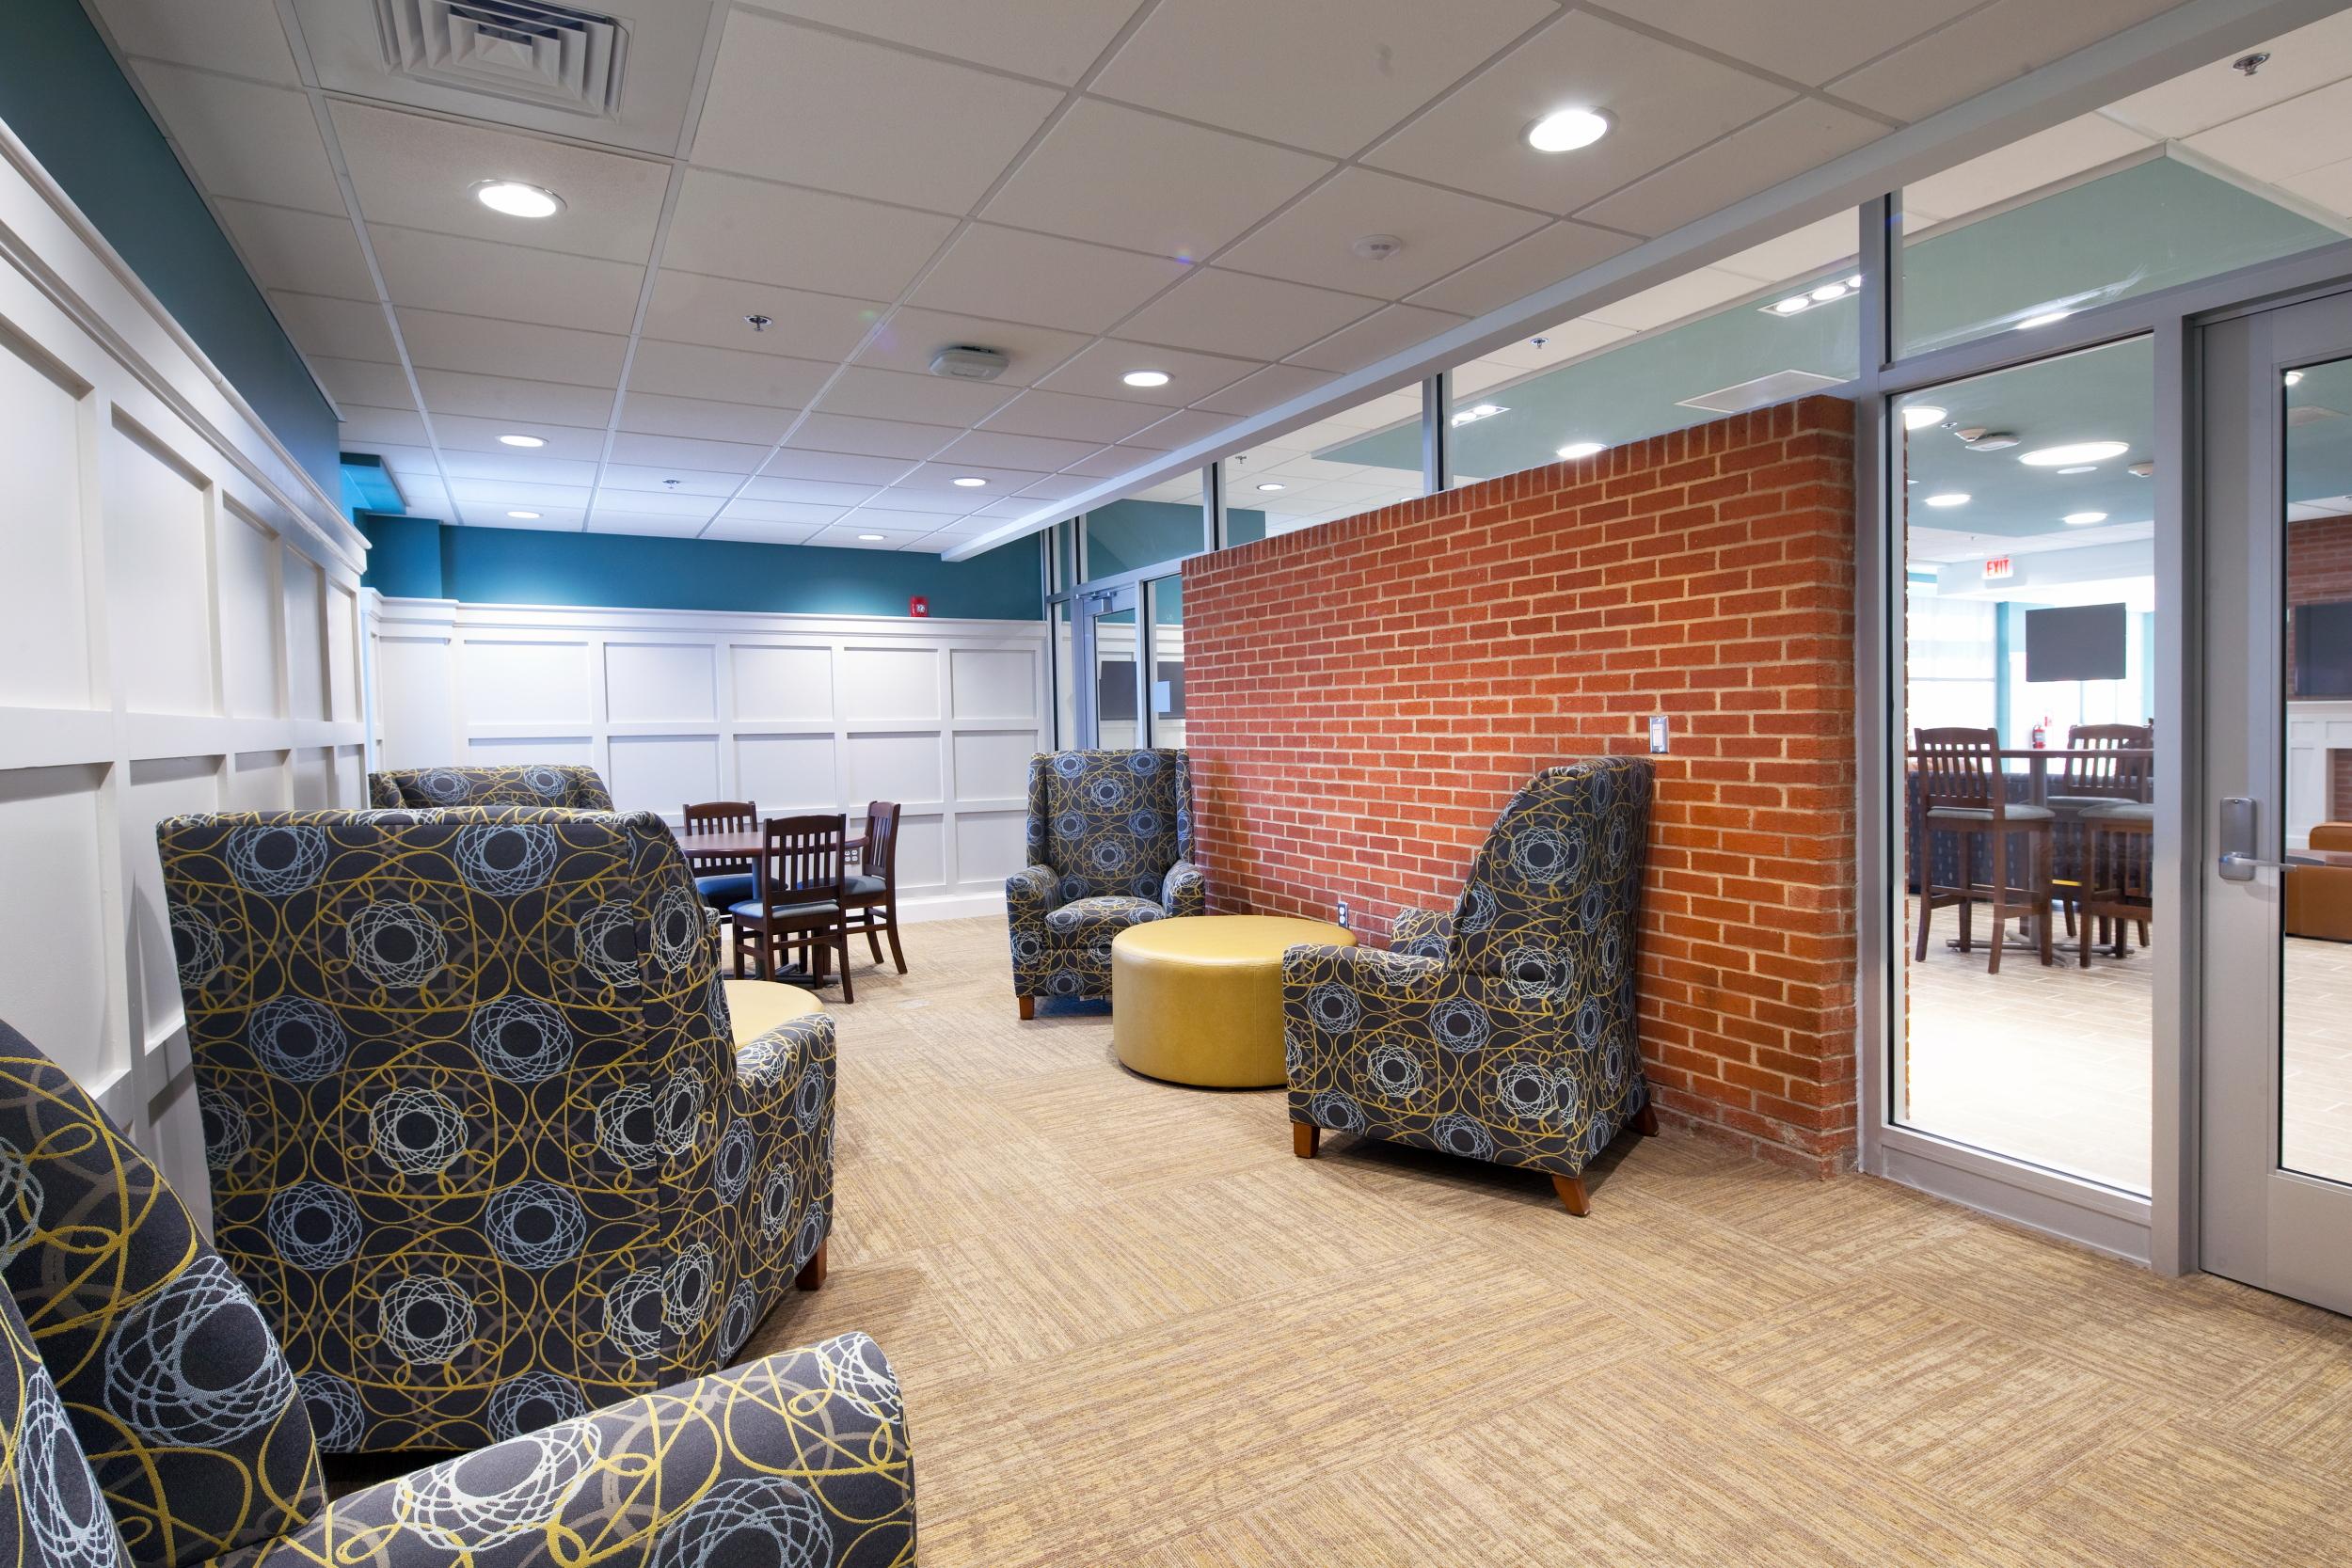 E U East Carolina University Belk Residence Hall Demolition And Replacement Davis Kane Architects Pa